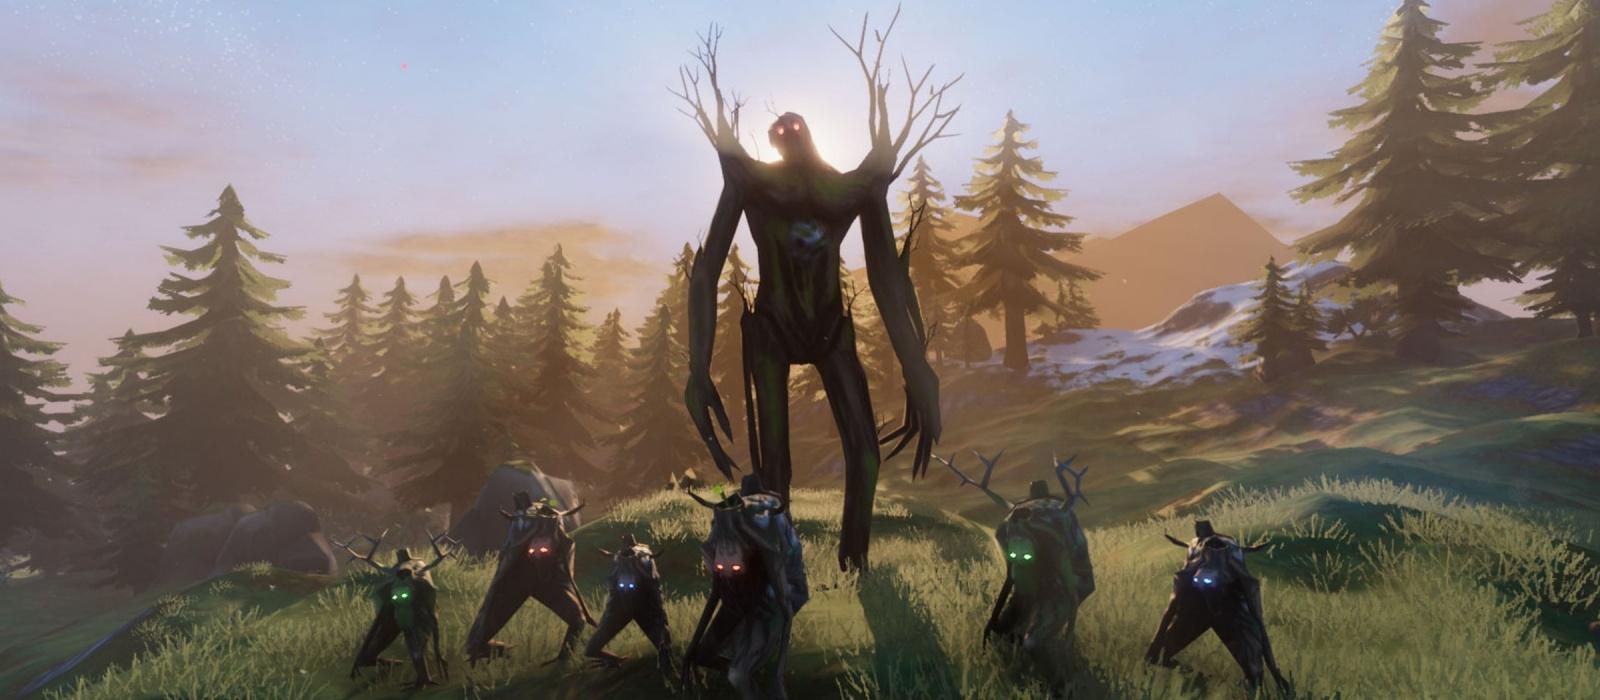 Valheim Bosses Walkthrough - How to Defeat Eiktur, the Ancient One and Mass of Bones